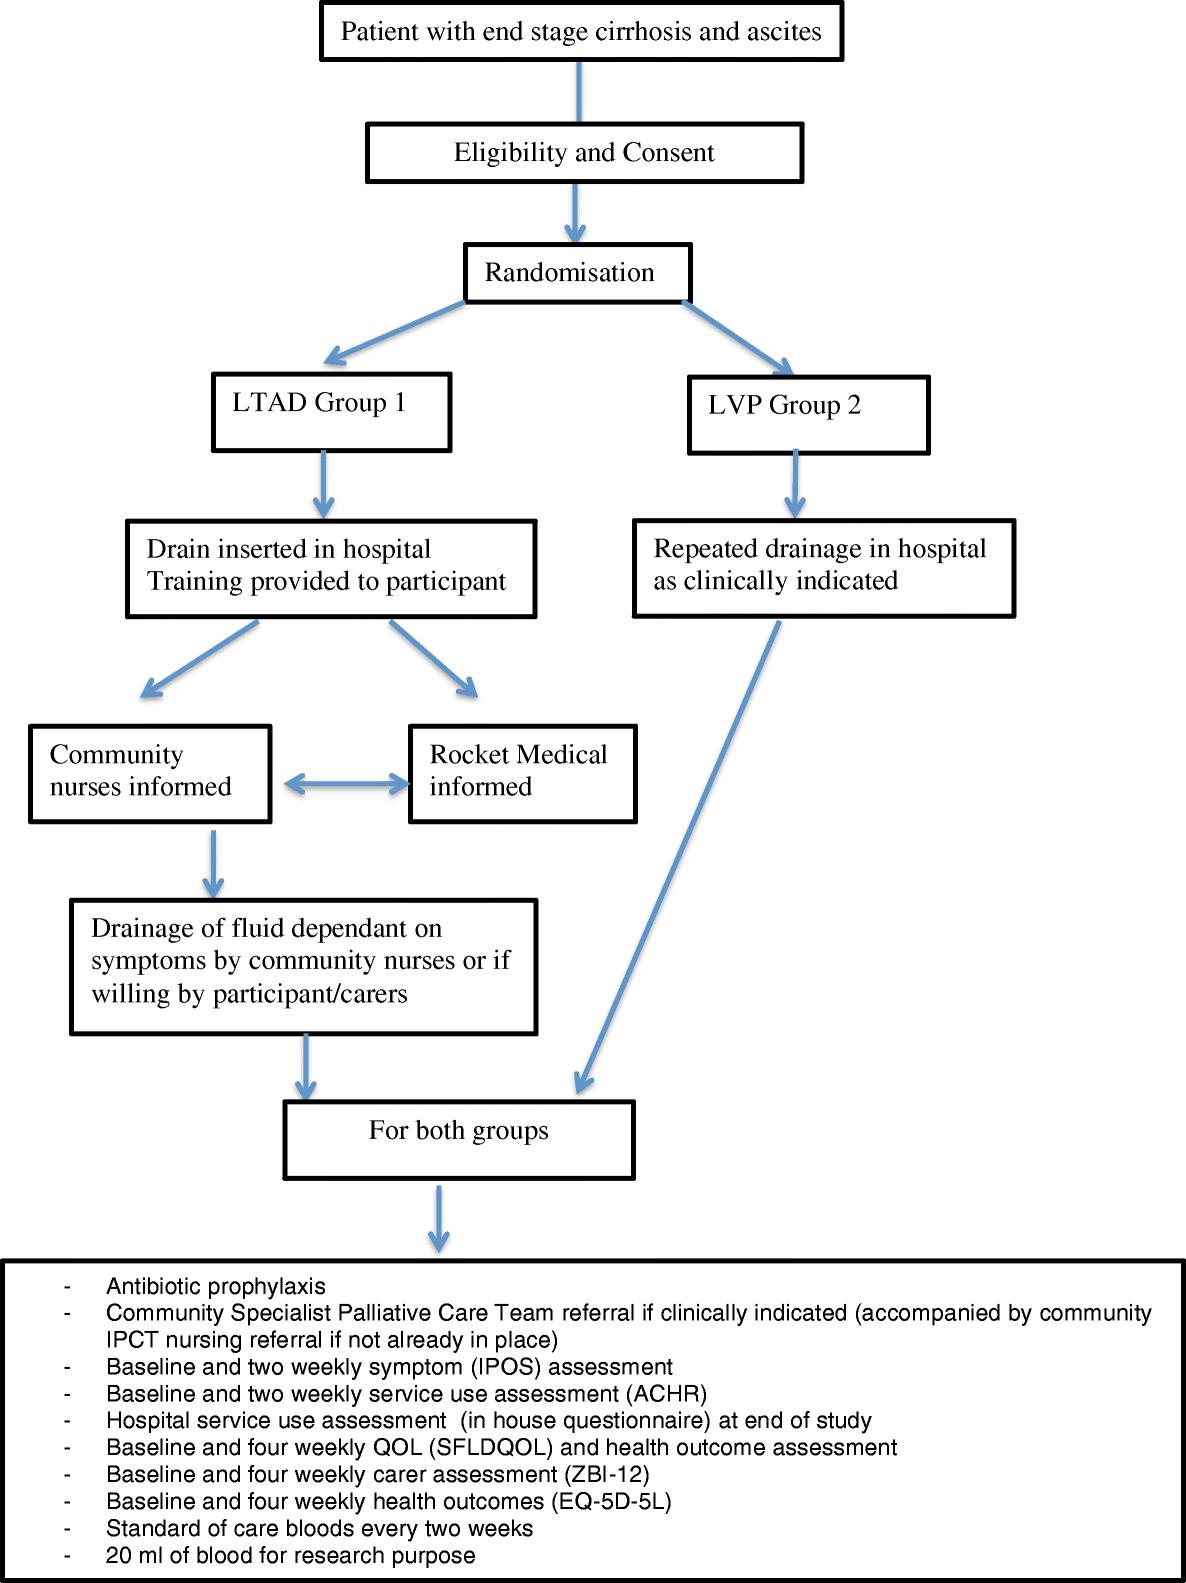 Palliative long-term abdominal drains versus repeated